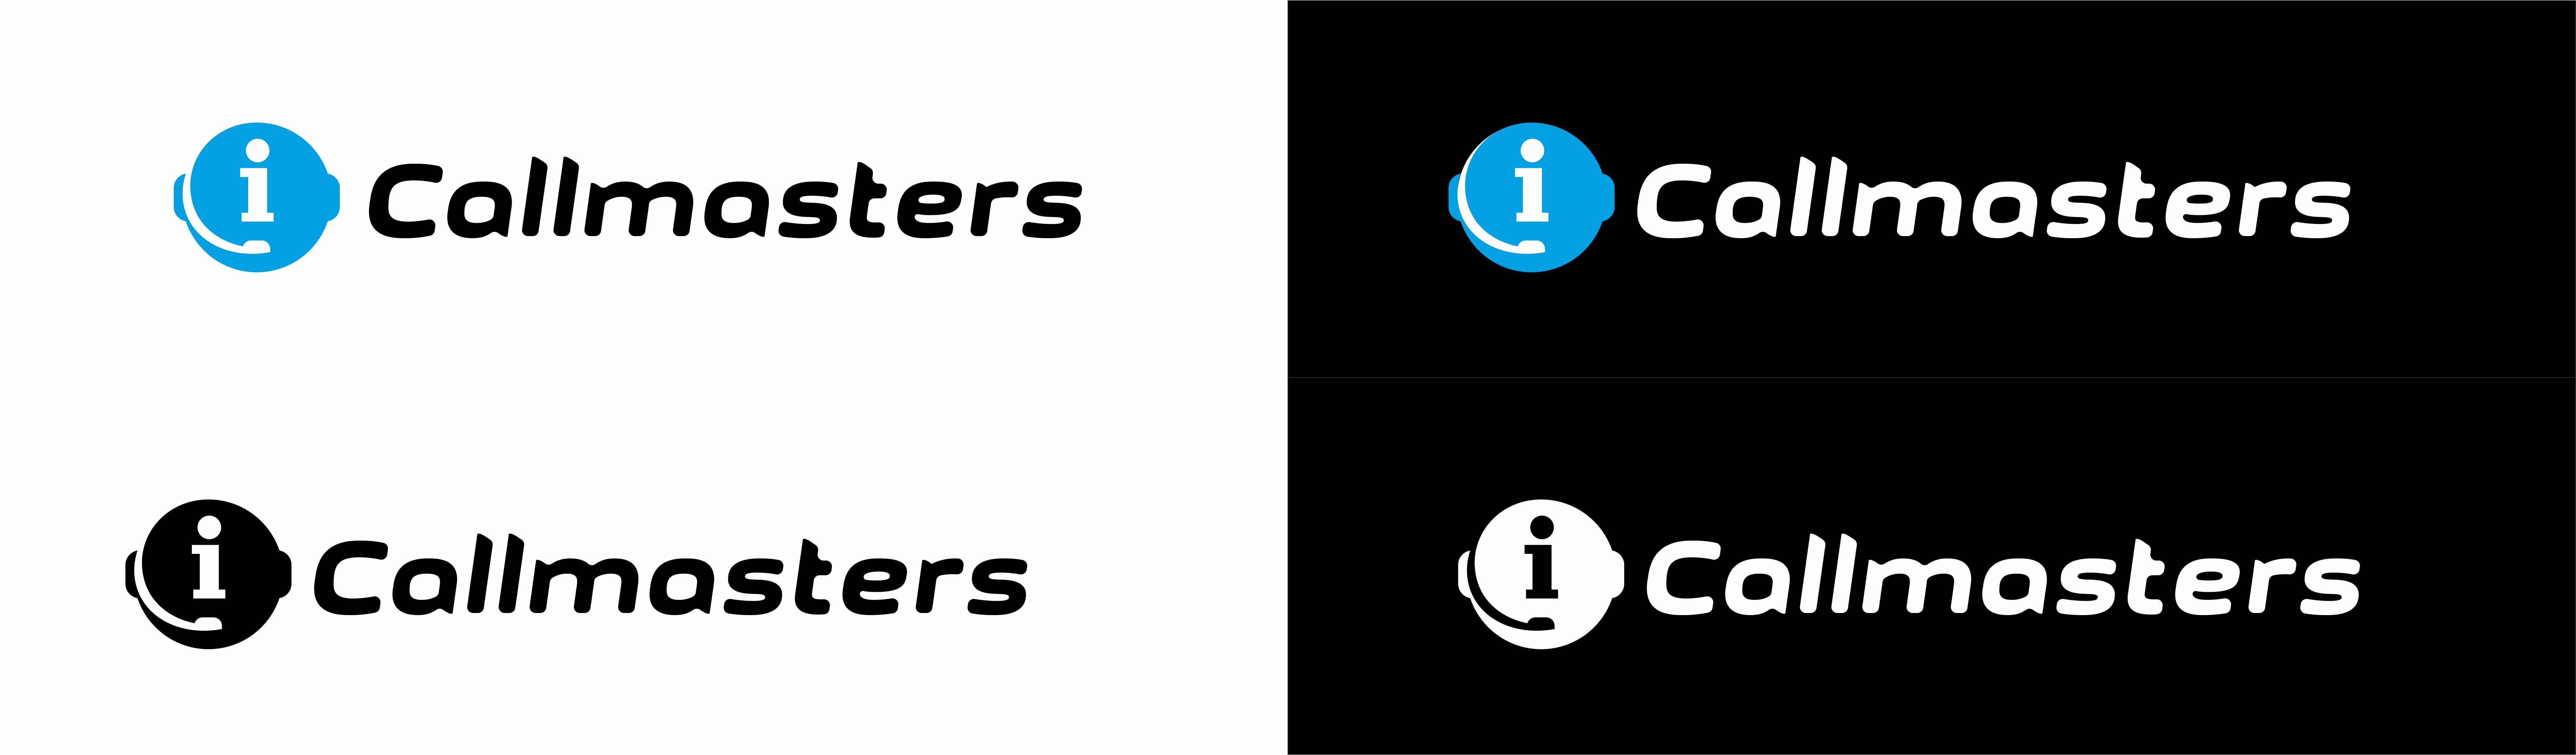 Логотип call-центра Callmasters  фото f_9325b74803e97fb4.jpg